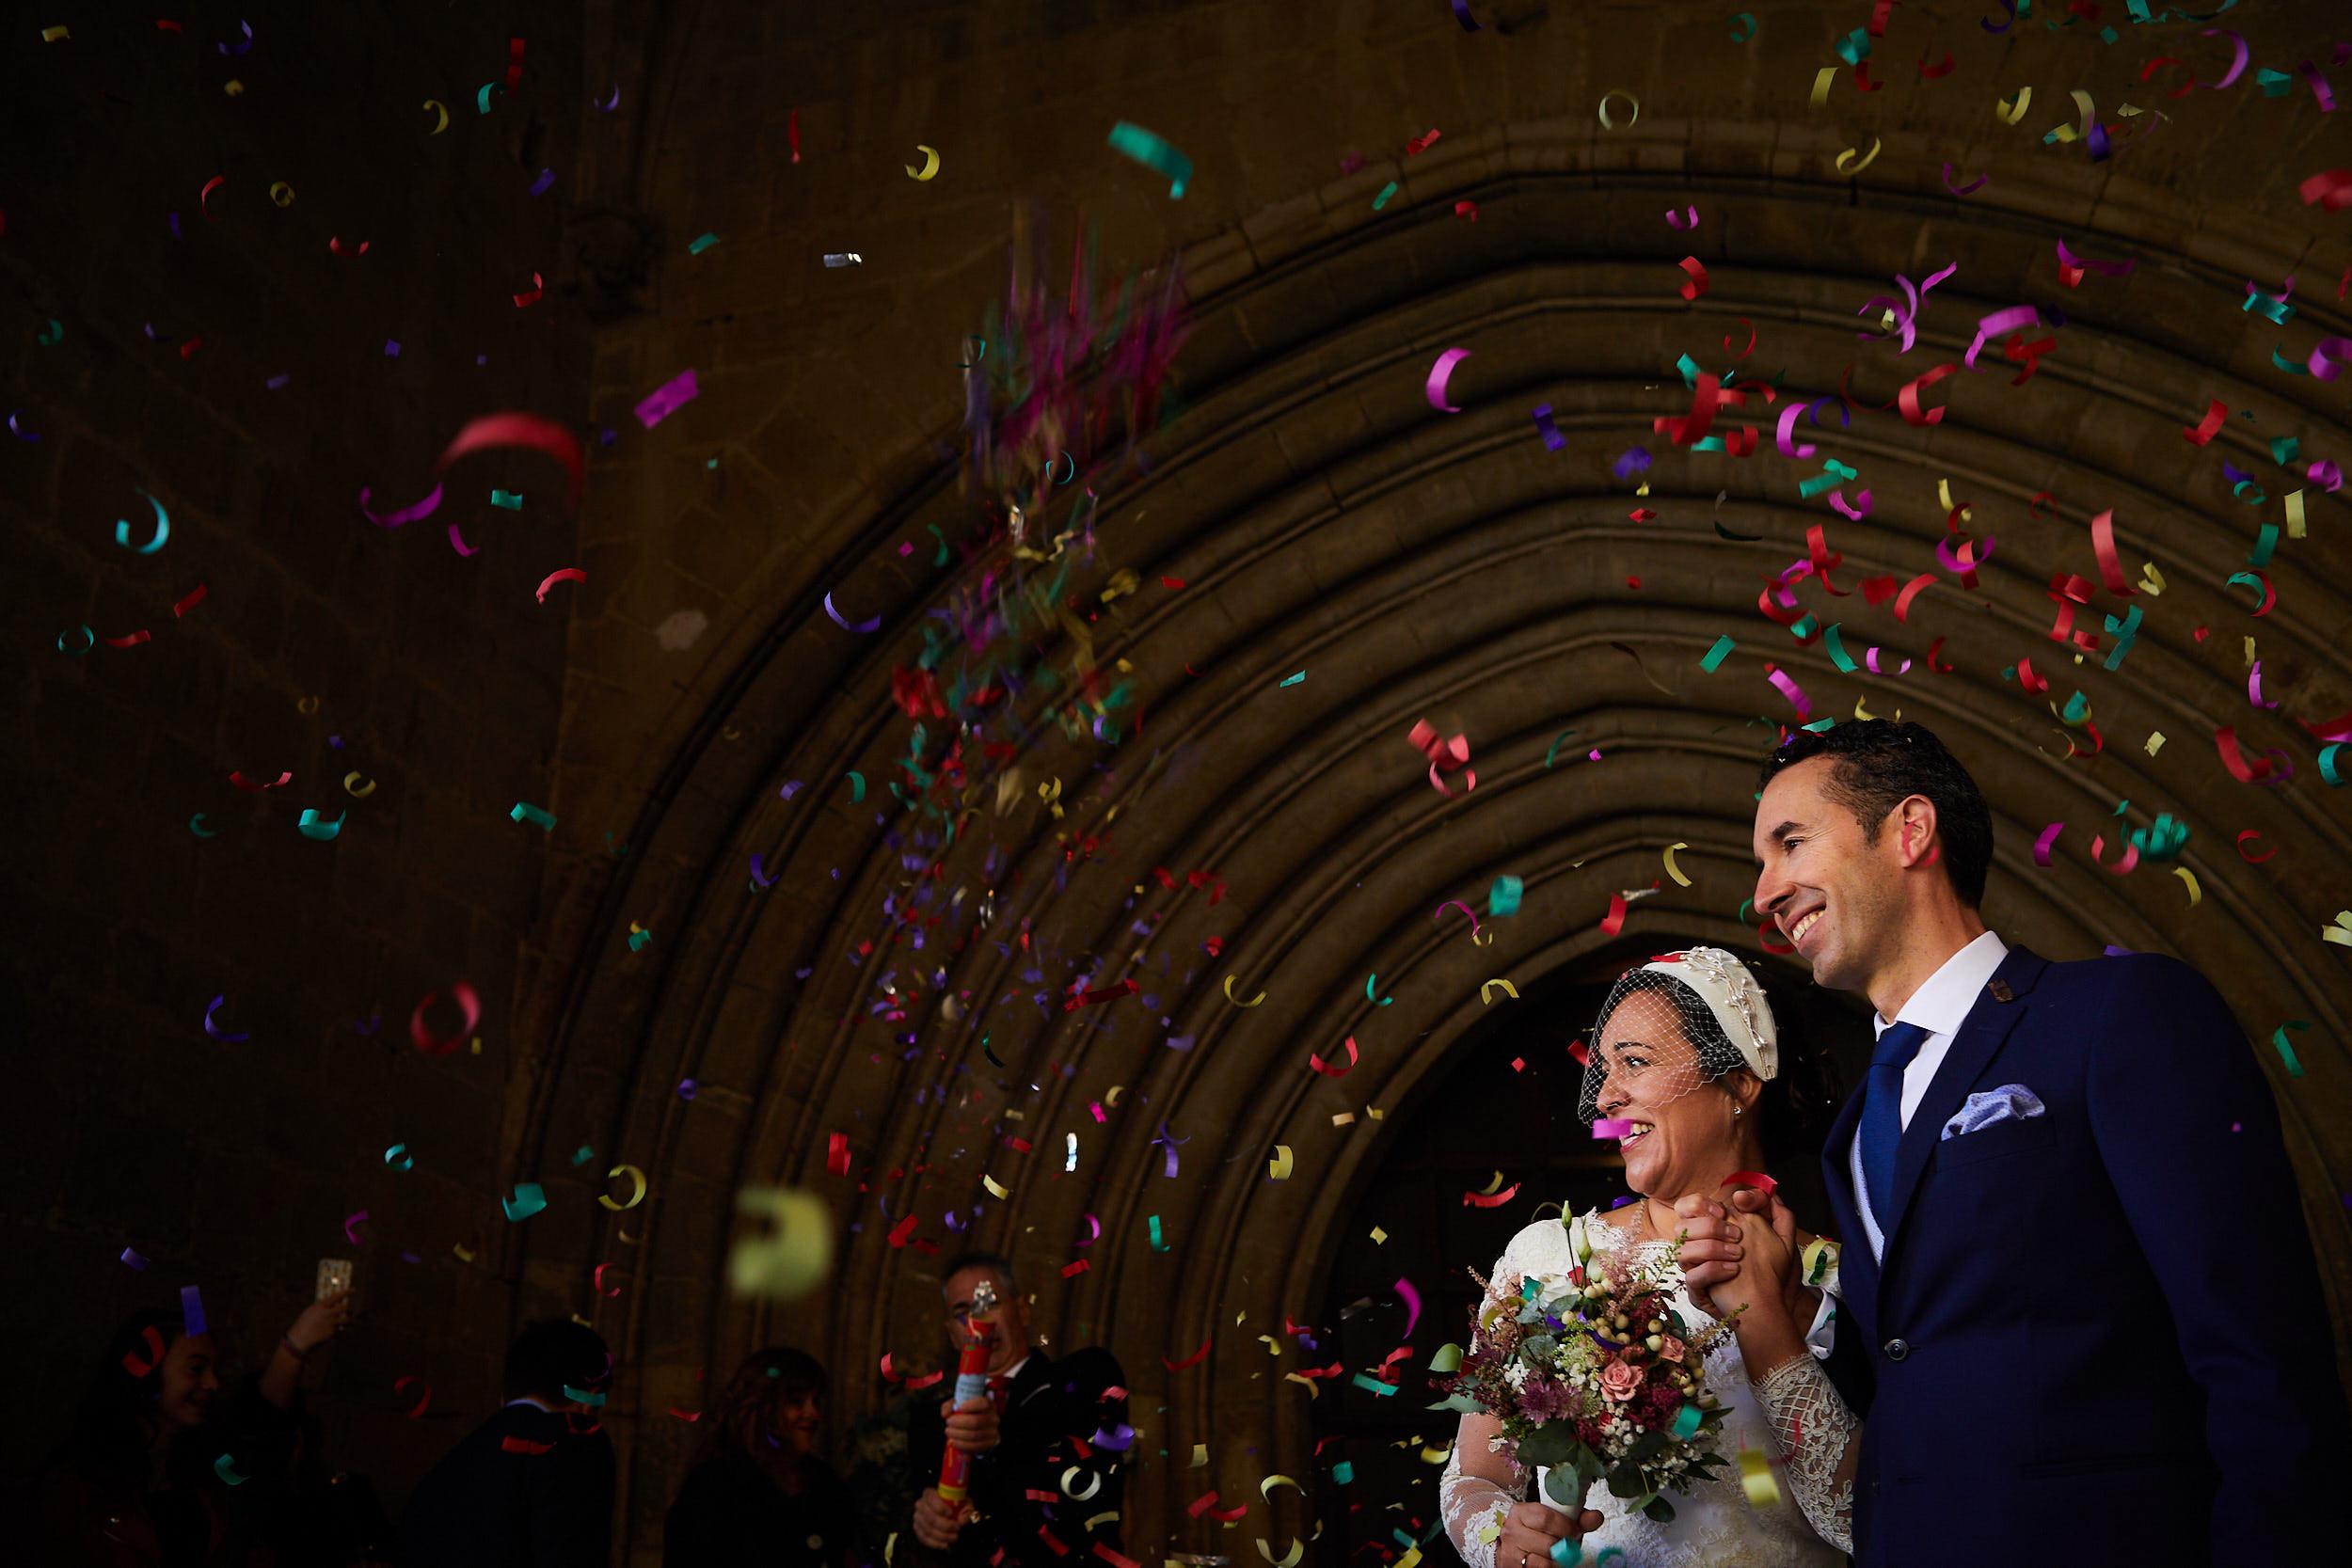 1811Basque_Country_Rioja_Wedding_Photographer_James_Sturcke_0042.jpg